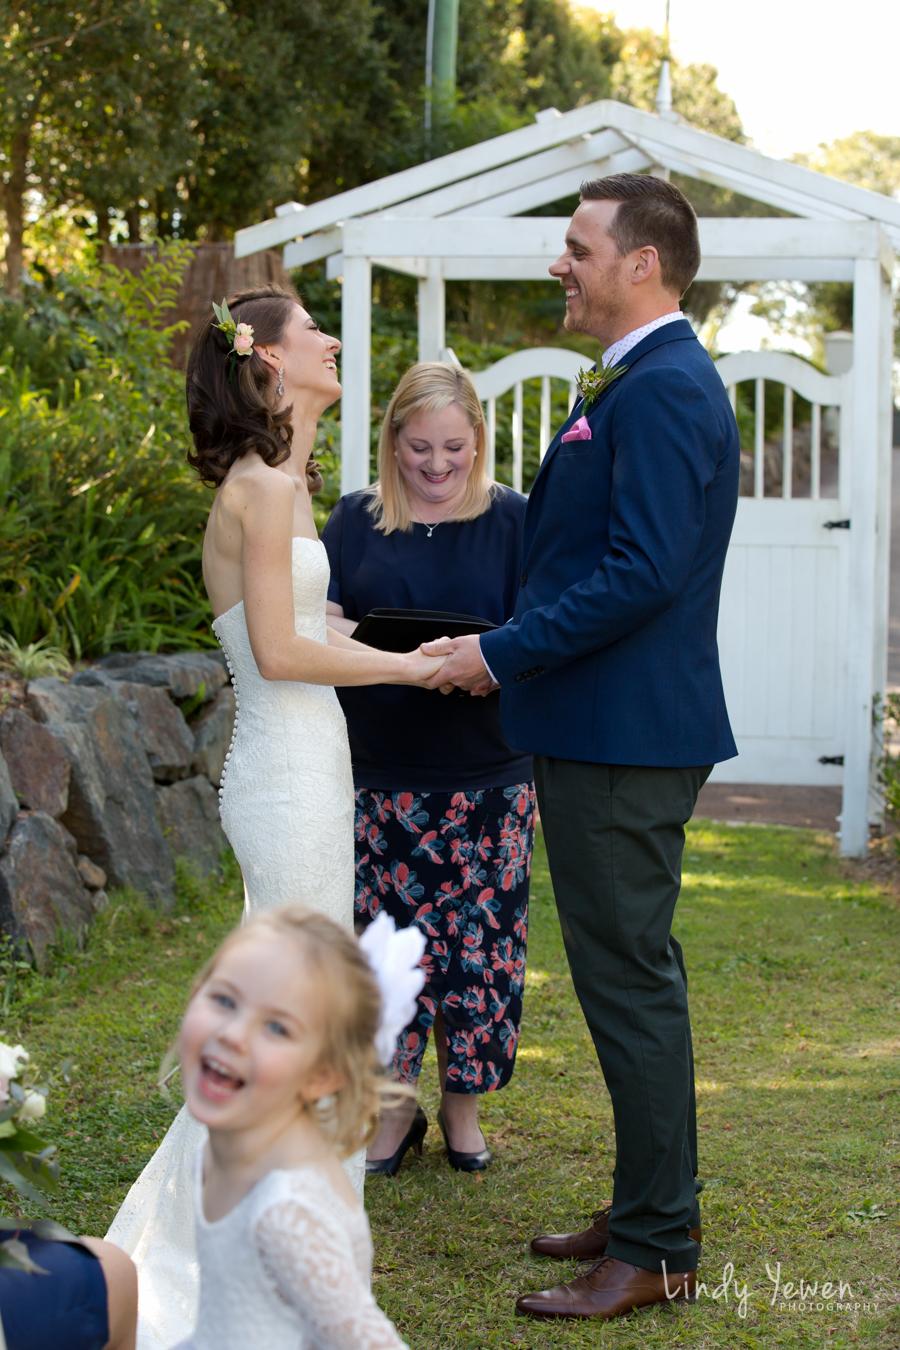 Montville-wedding-photographer-Lauren-Kirby 104.jpg